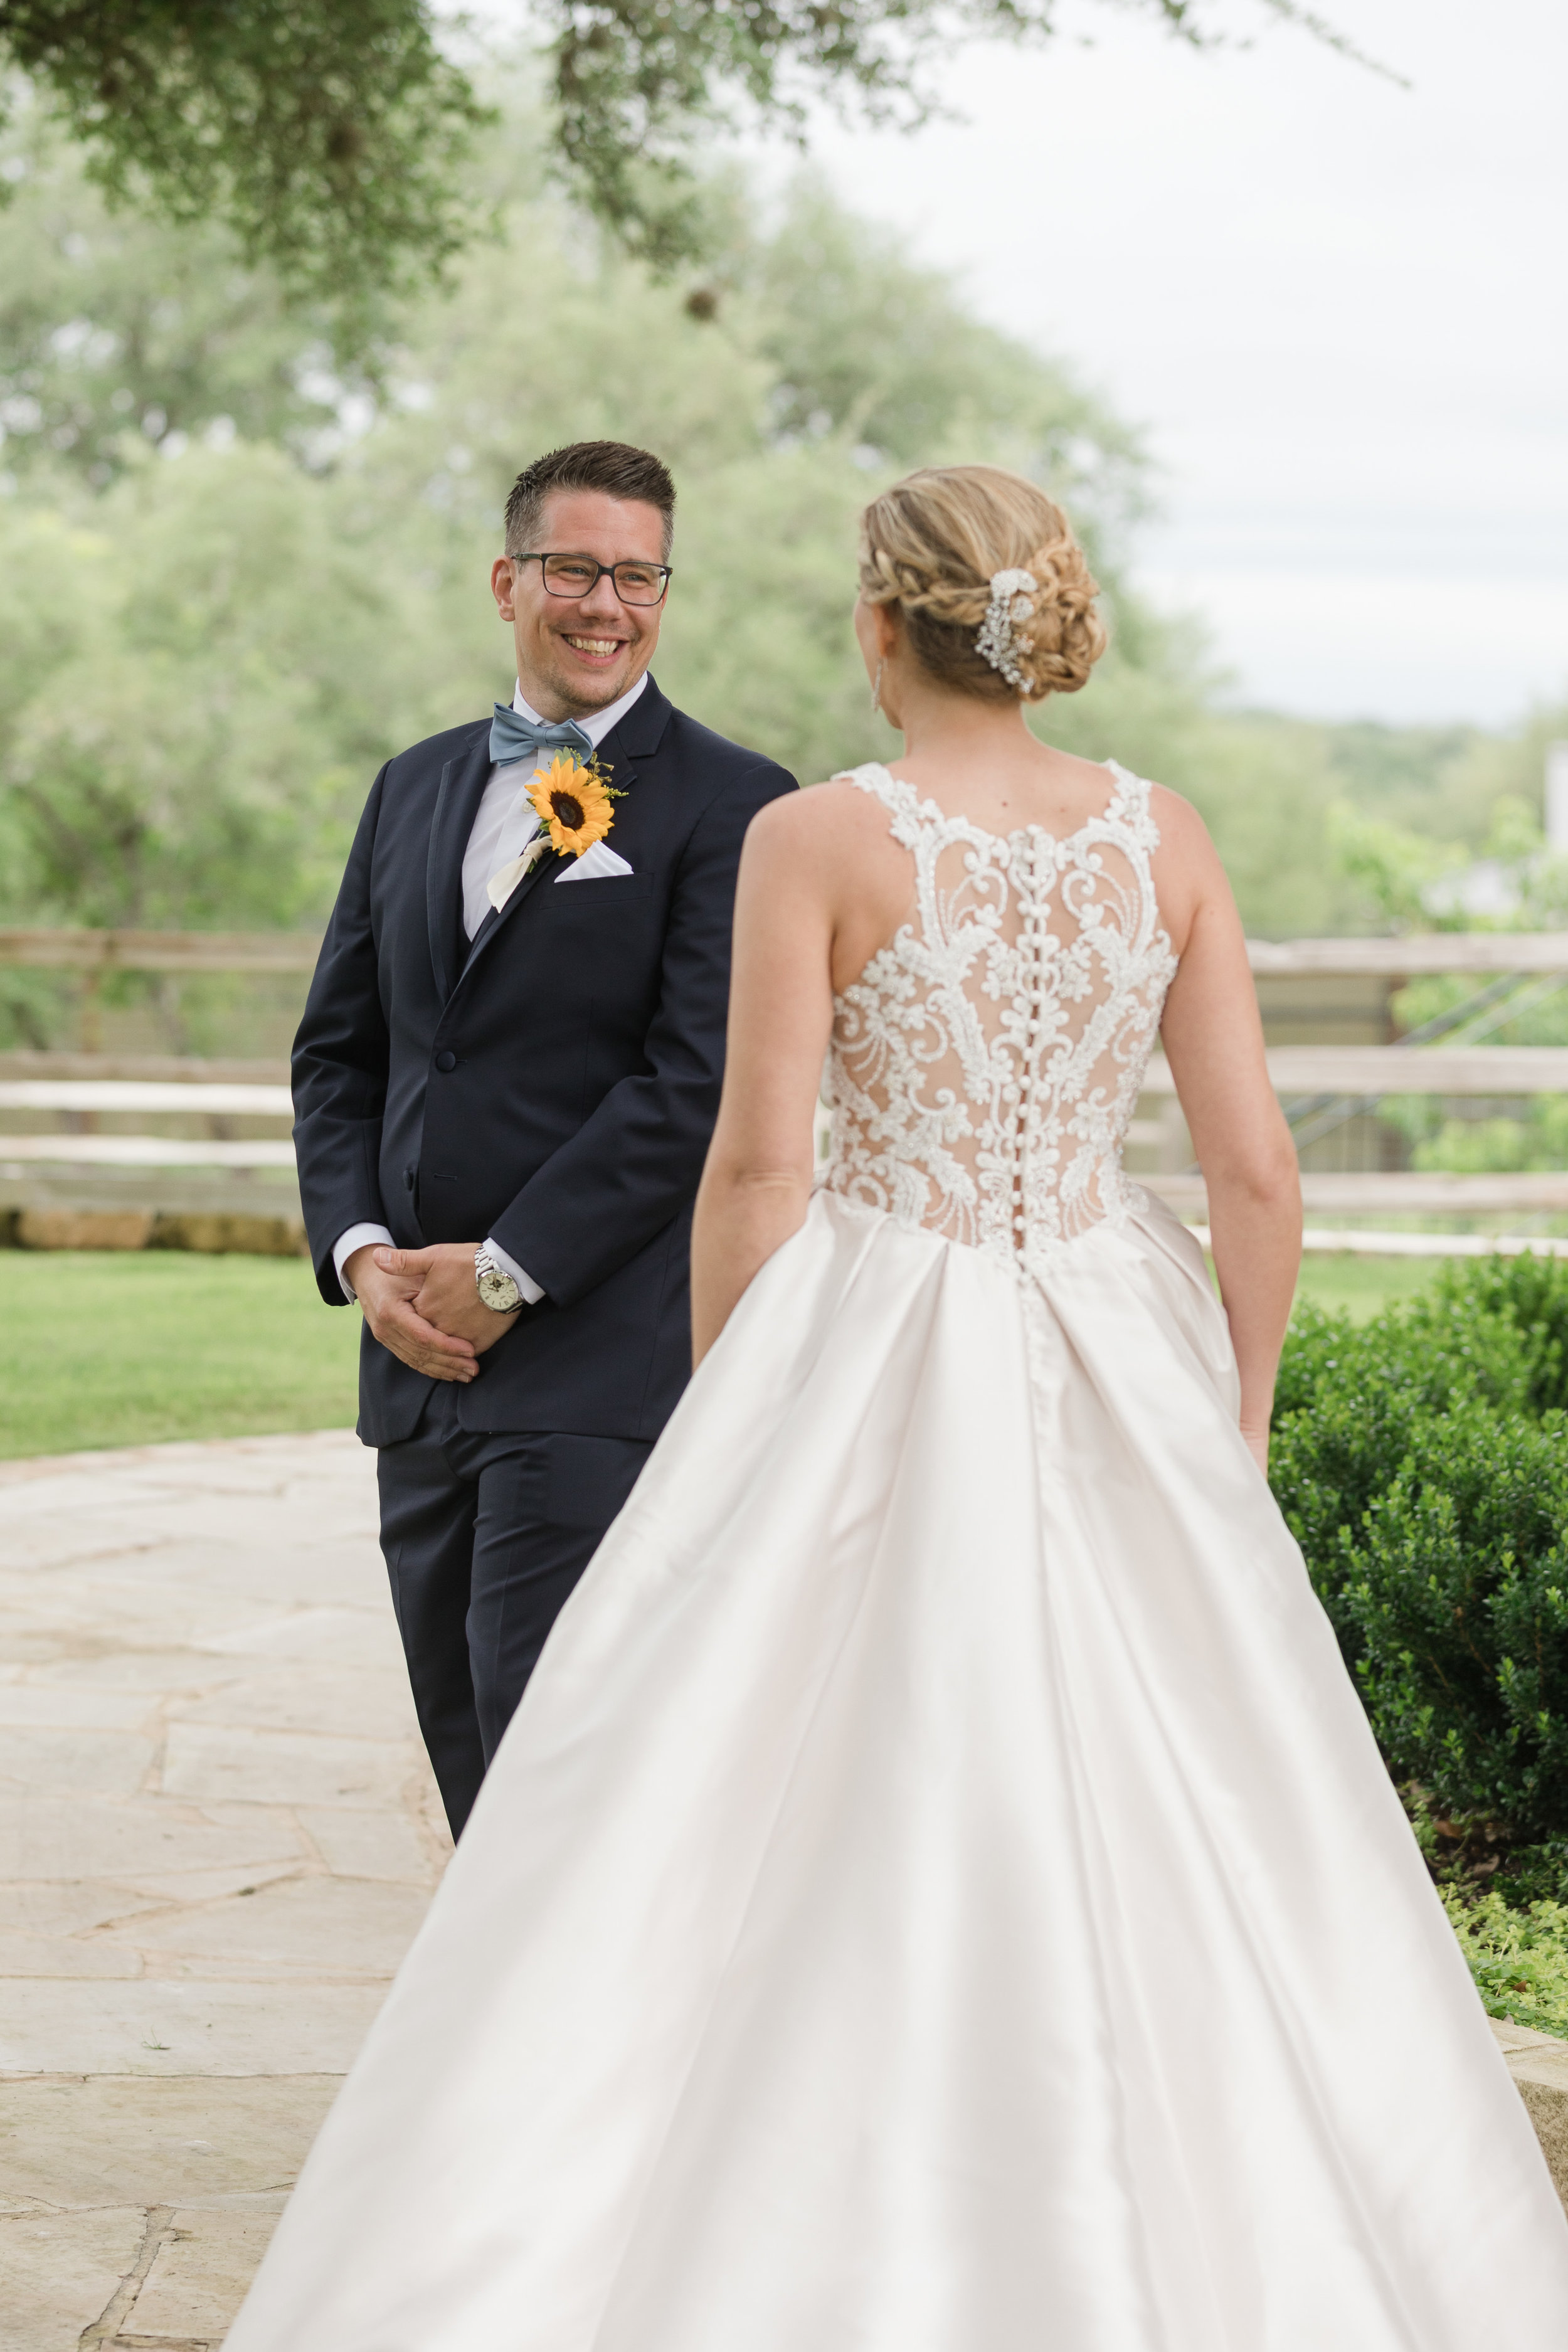 Laufs-Wedding-224.jpg